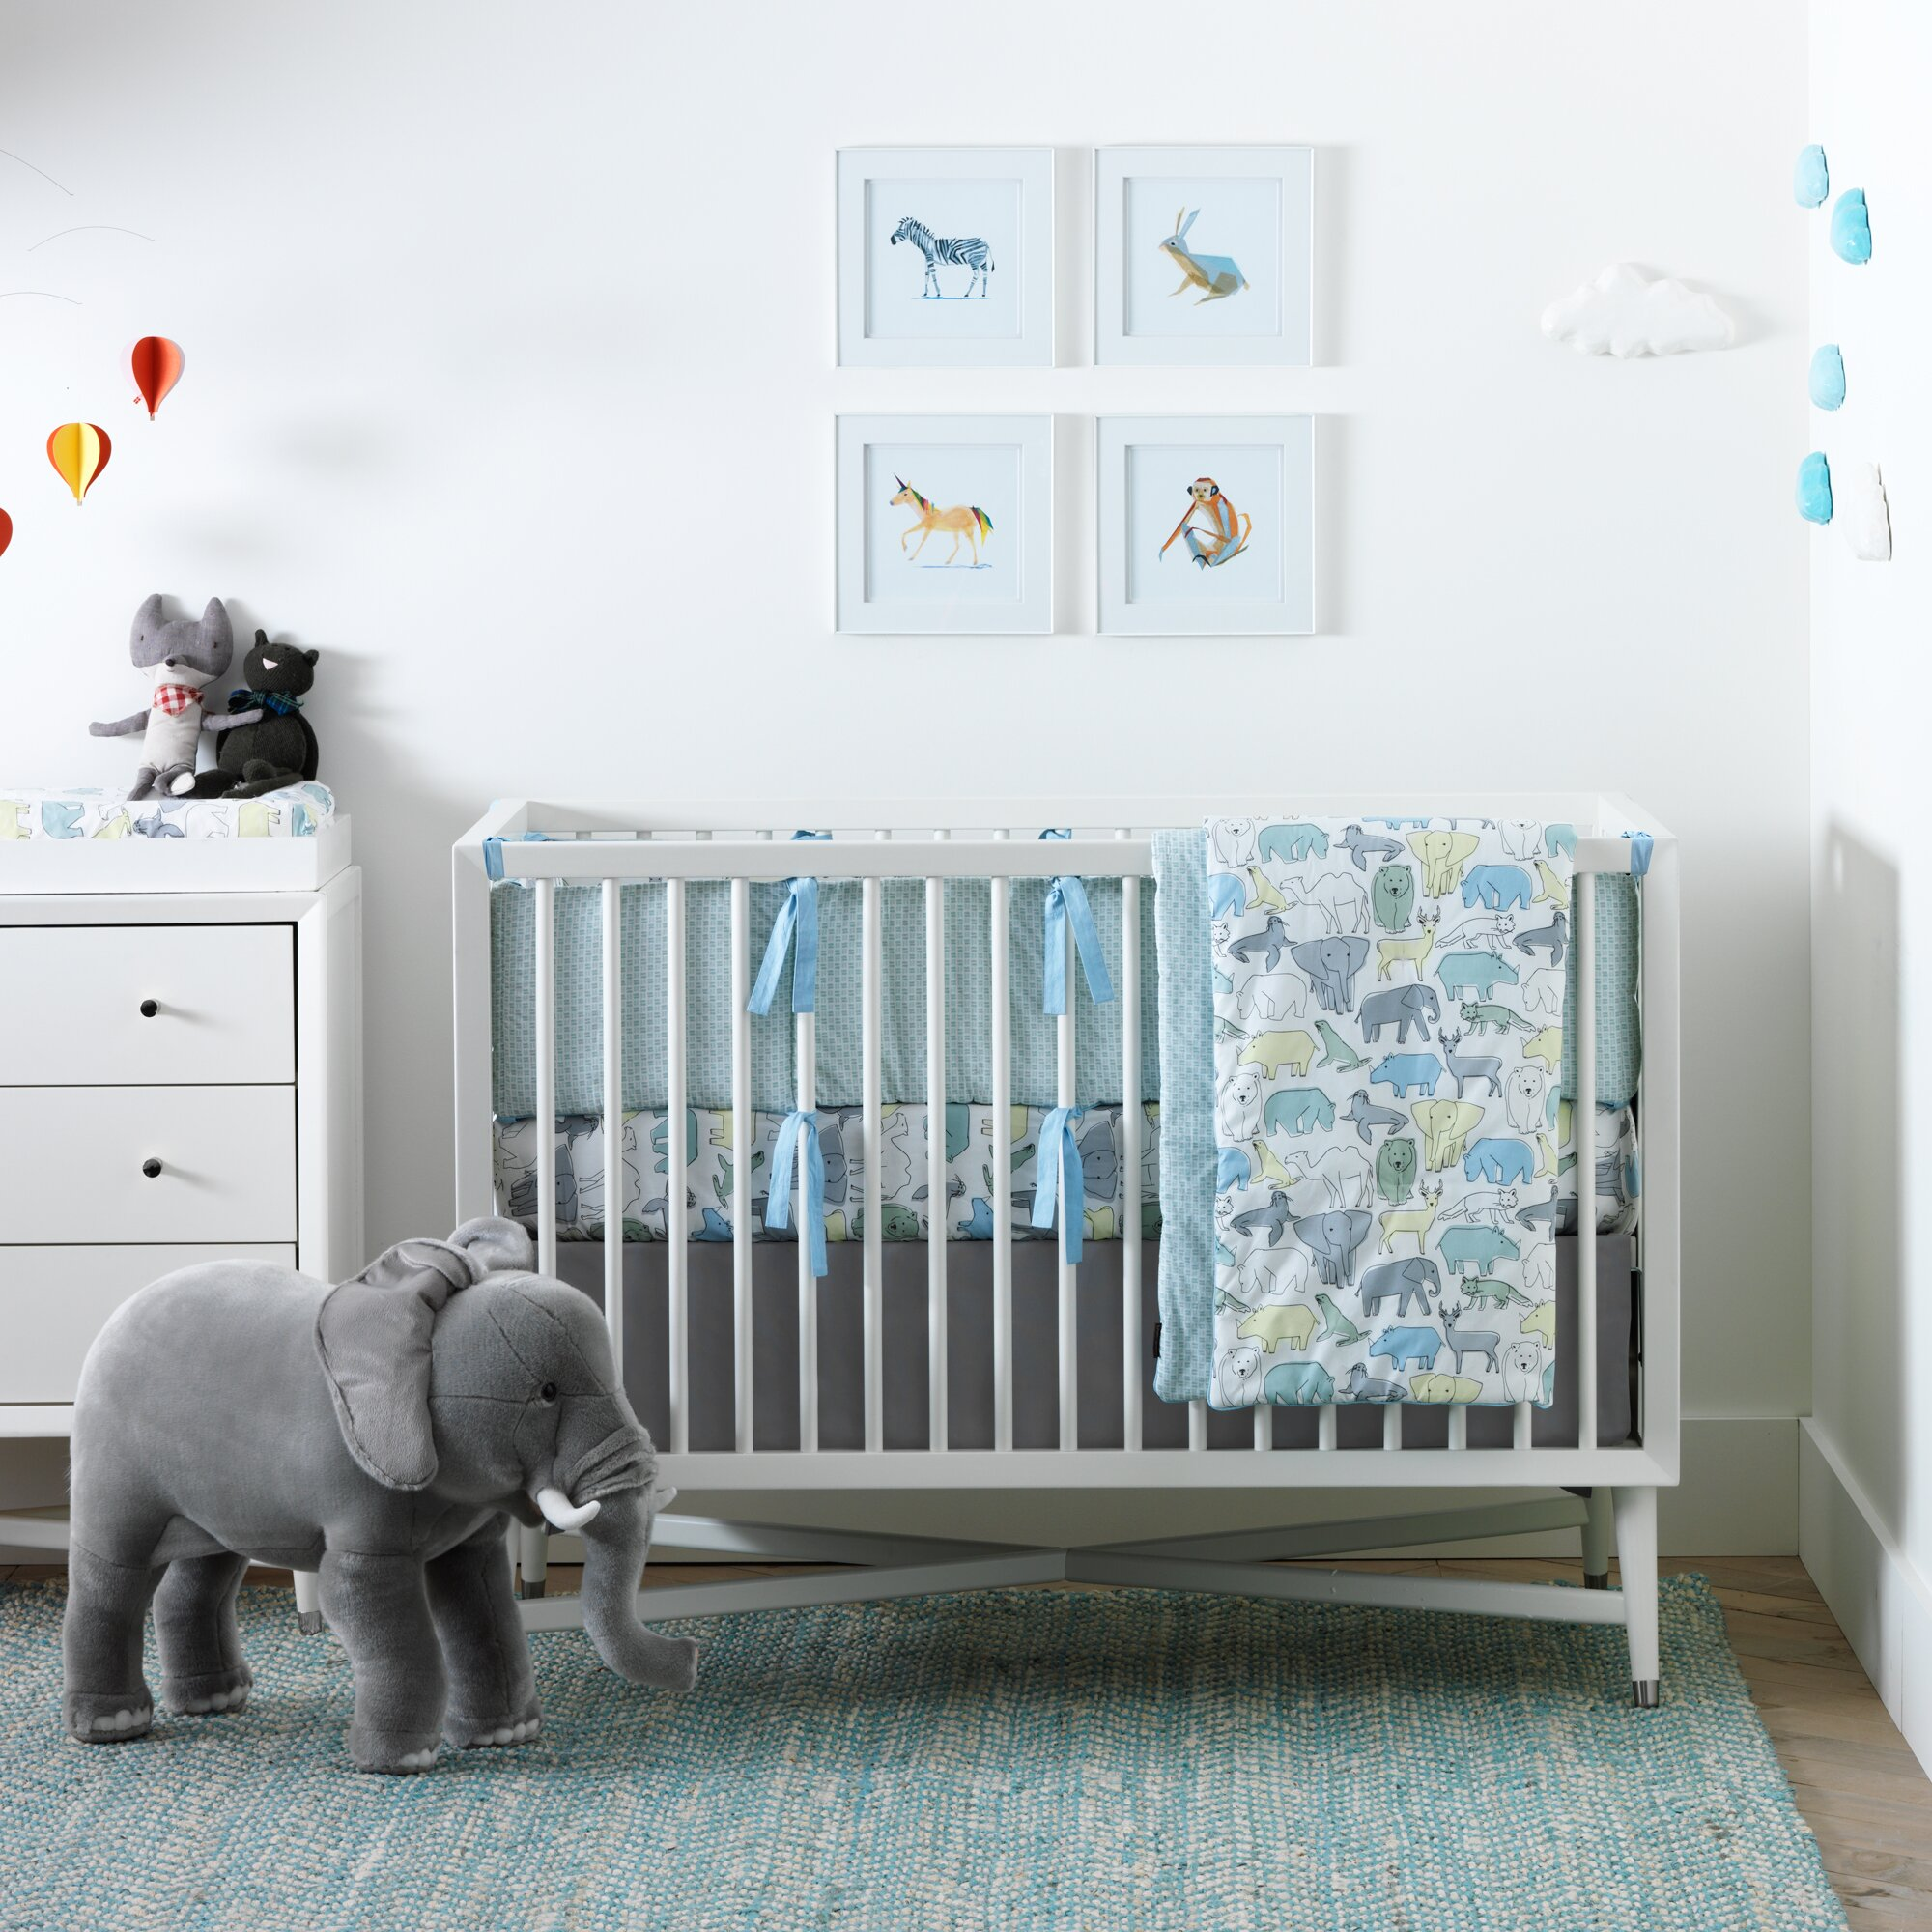 dwellstudio caravan nursery bedding collection dwellstudio